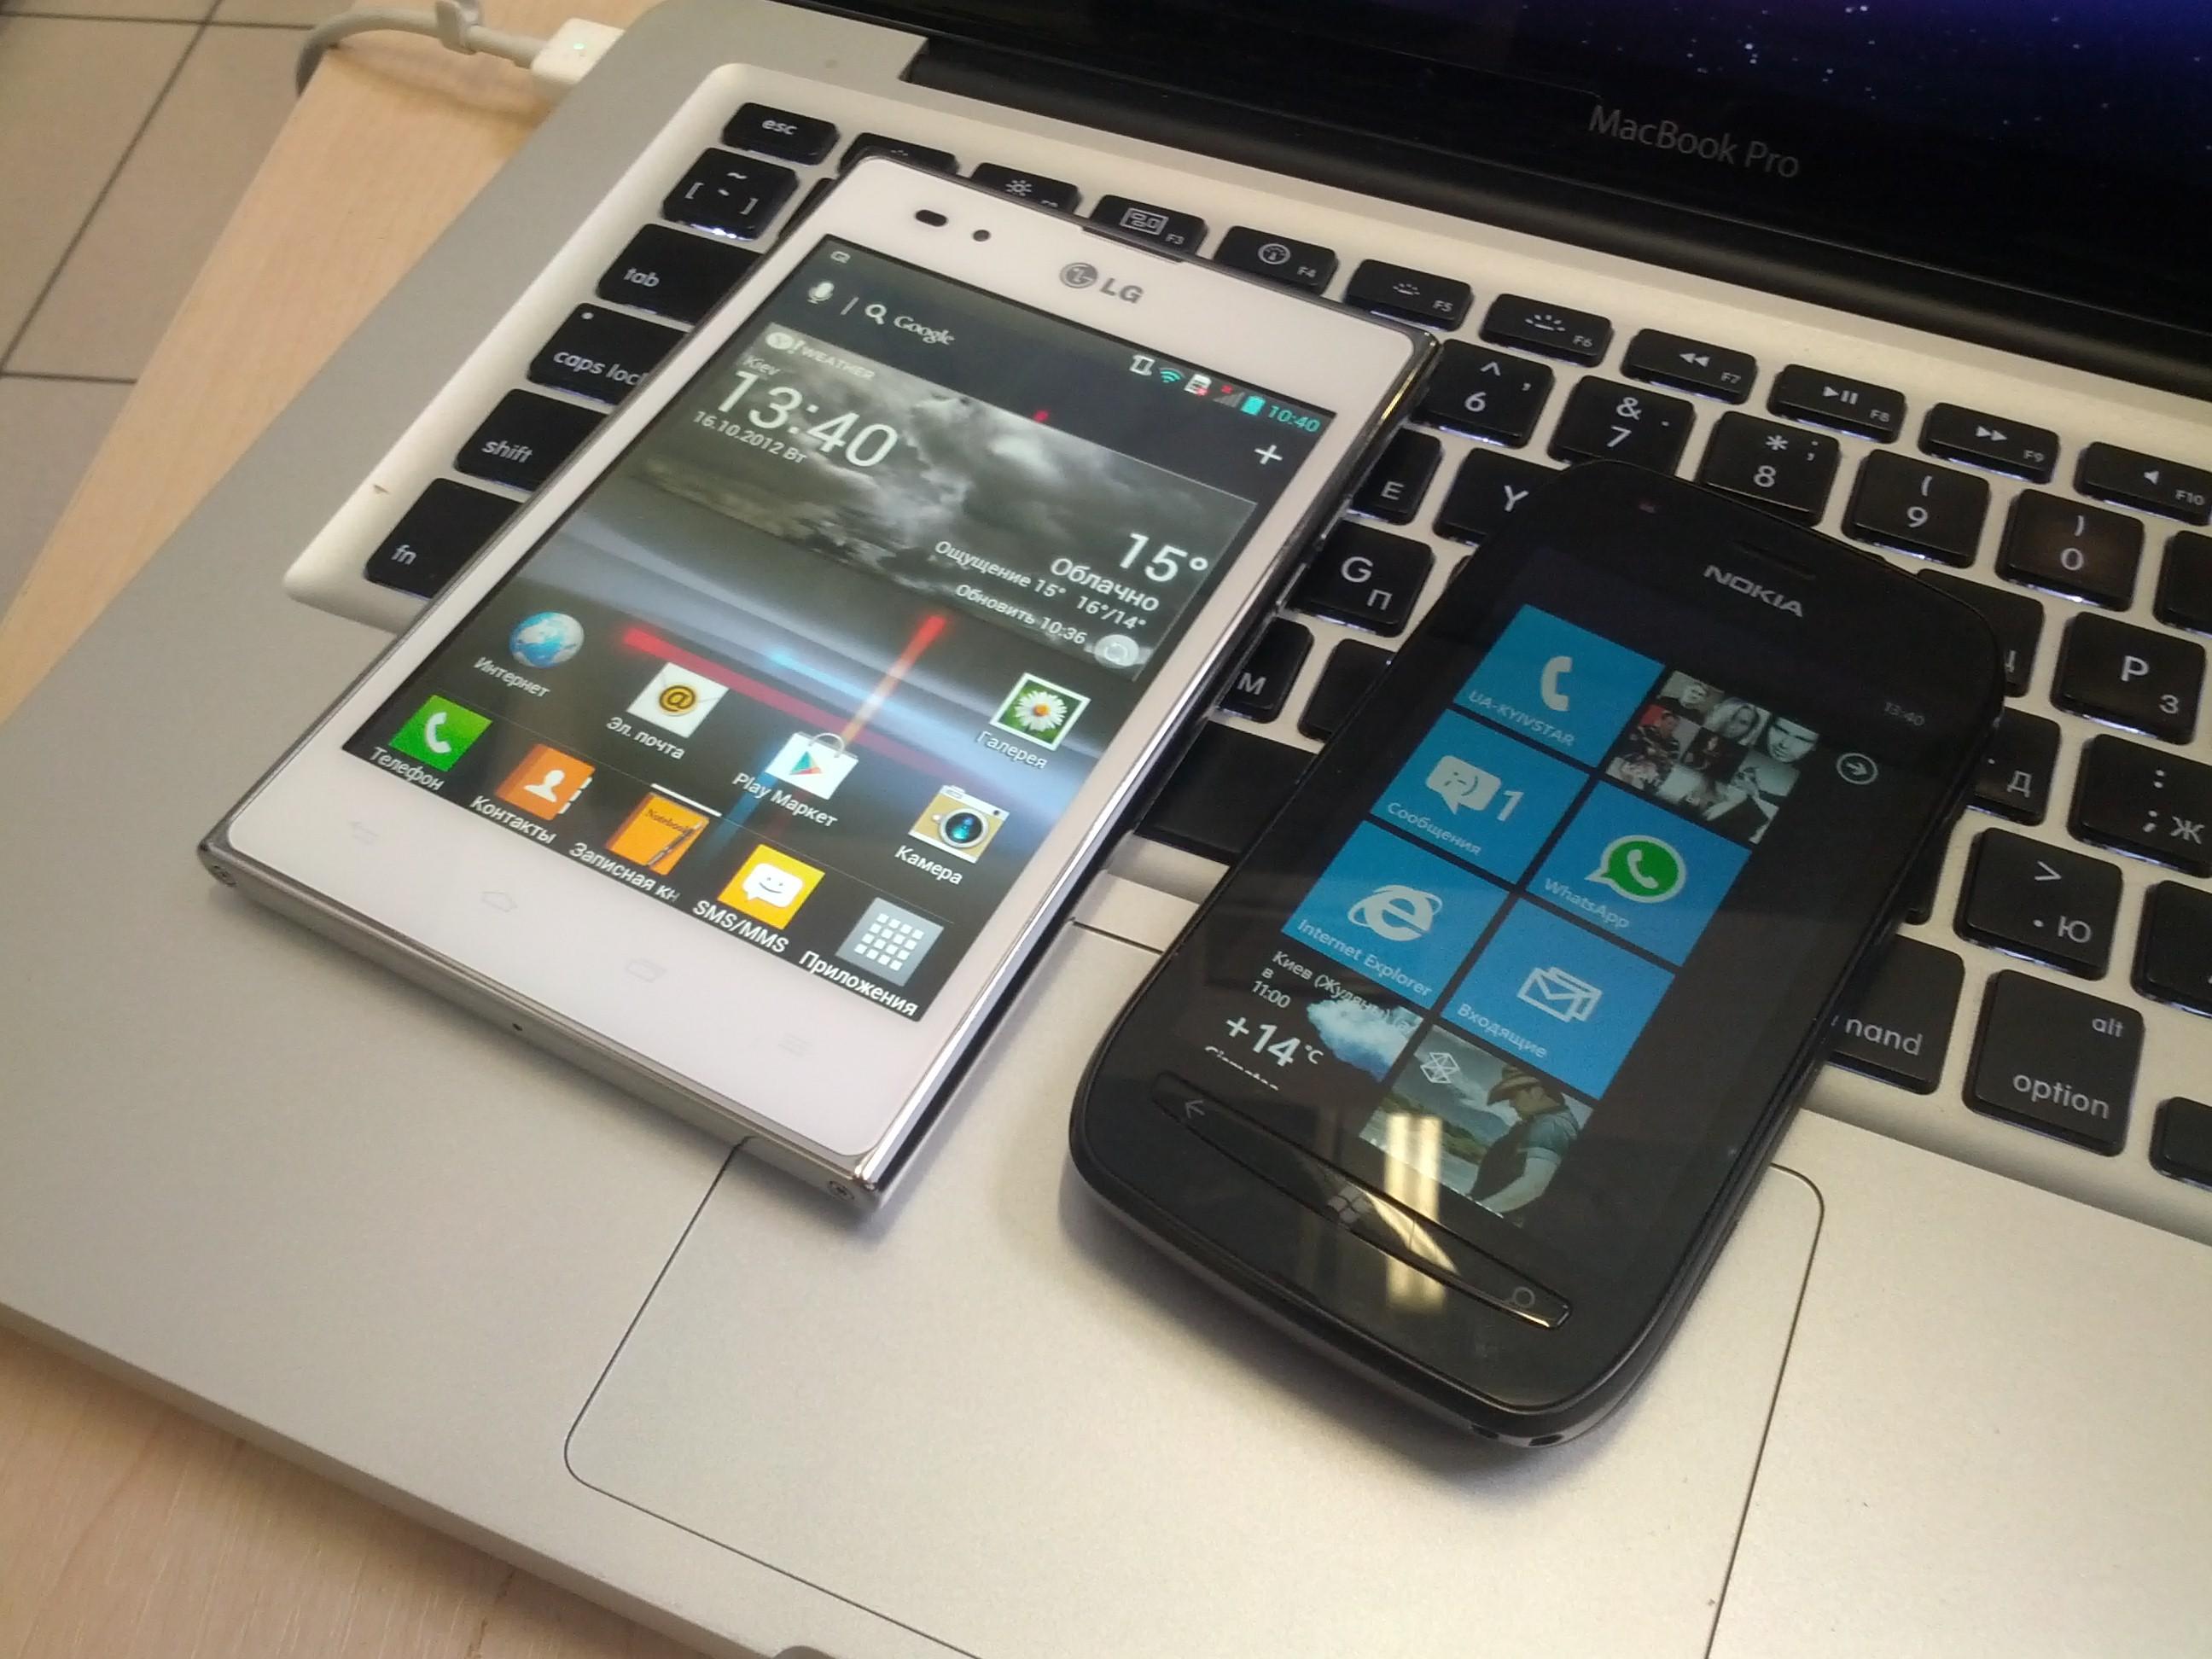 Optimus Vu в сравнении с Nokia Lumia 710